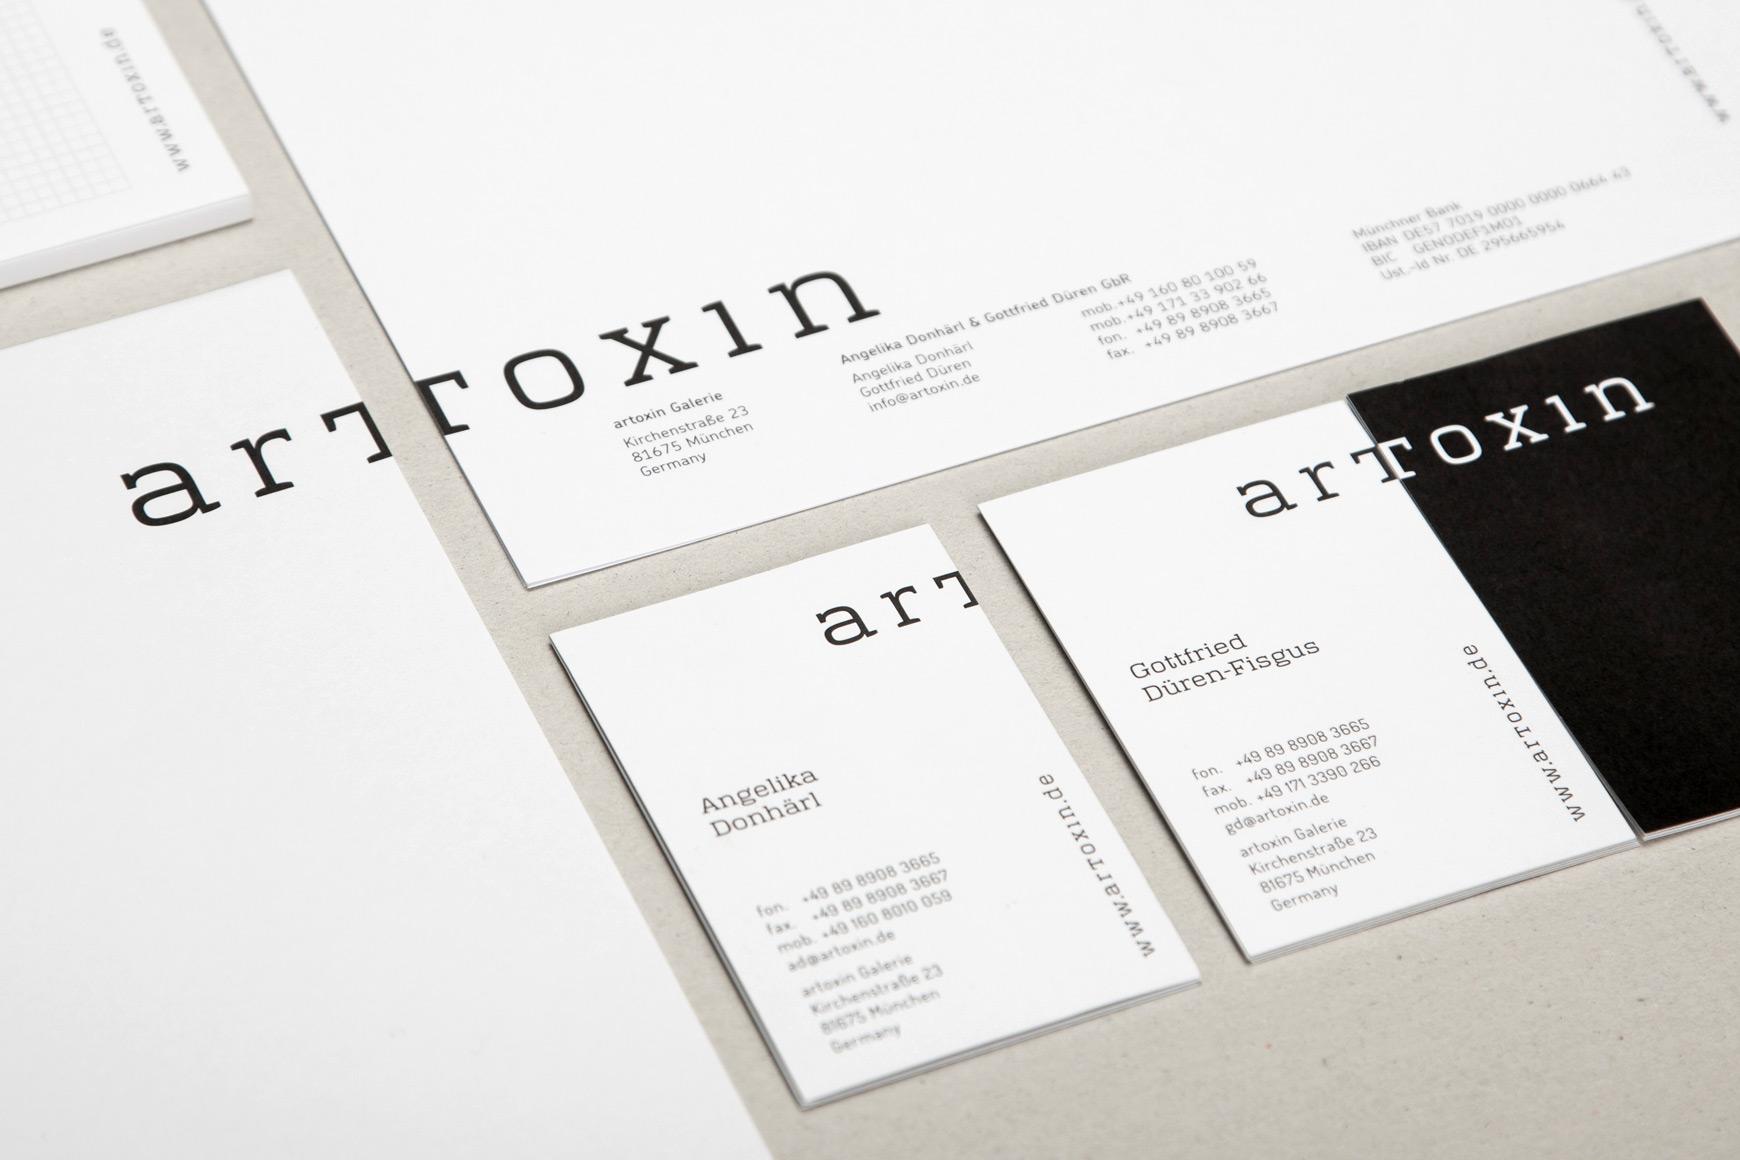 Artoxin Schaufenster